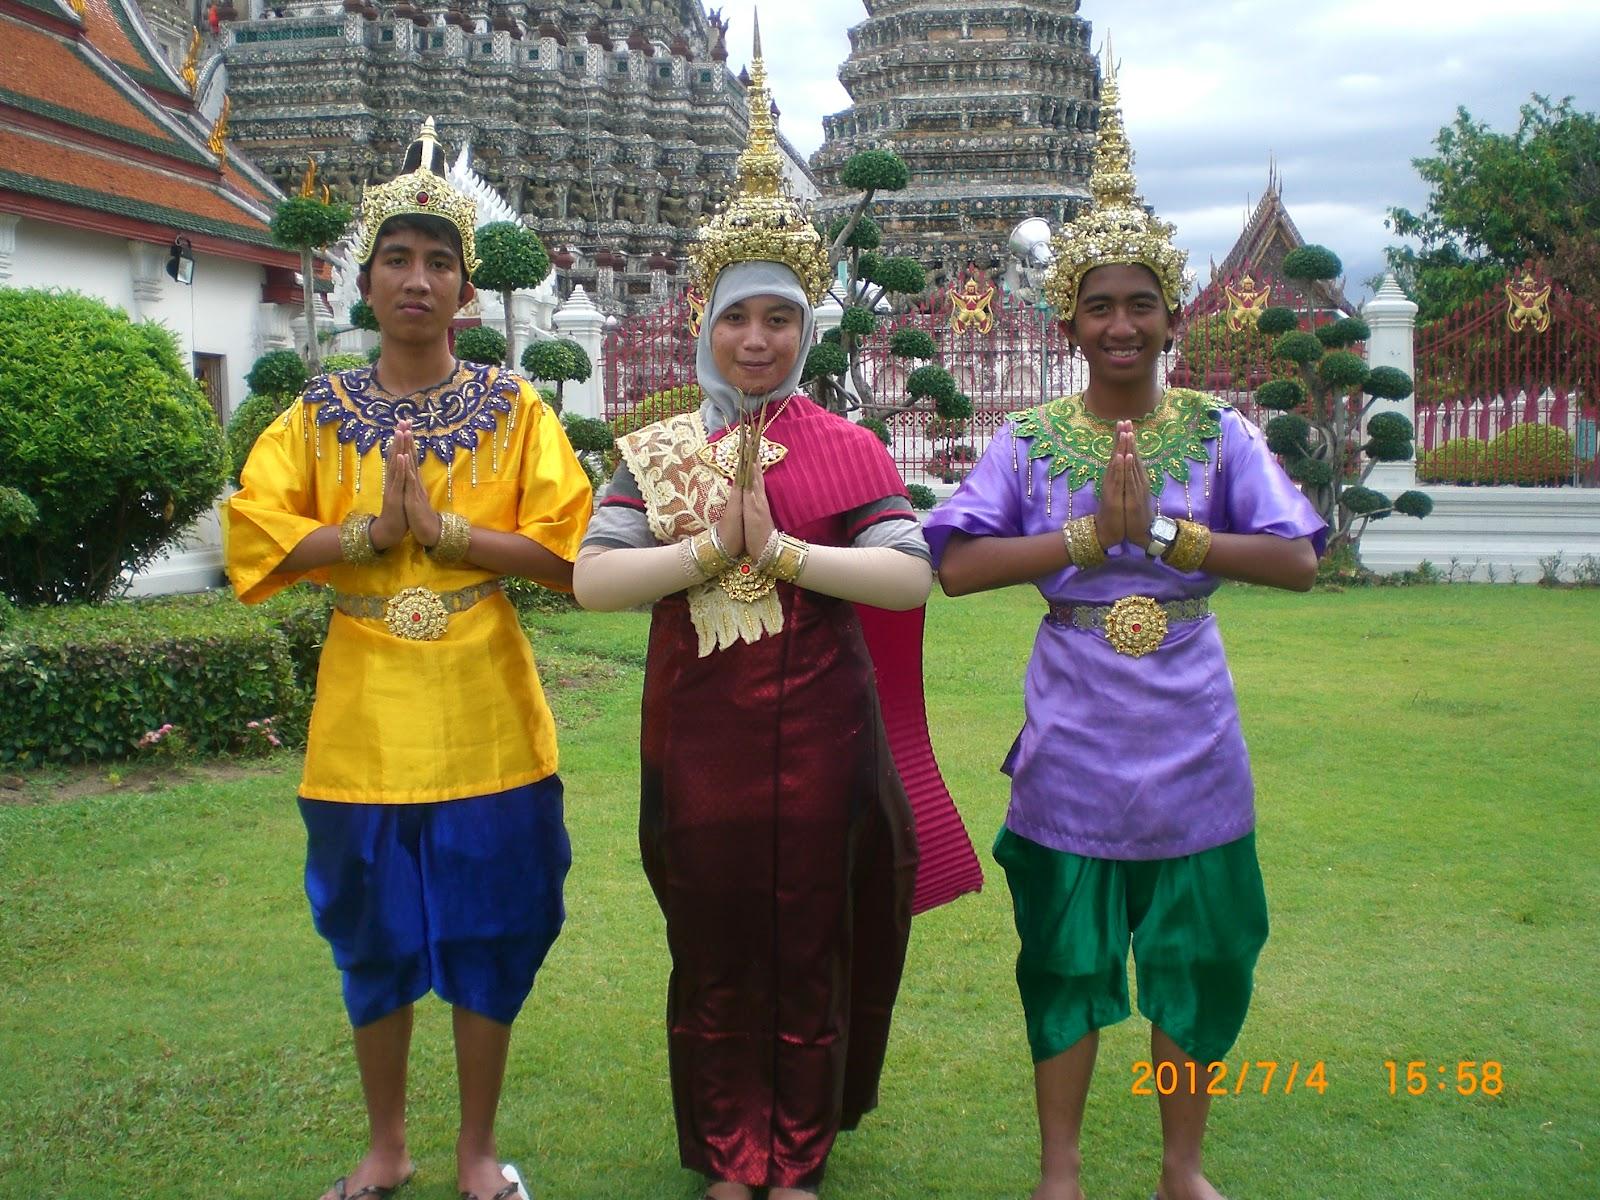 Jual Baju Khas Thailand | newhairstylesformen2014.com